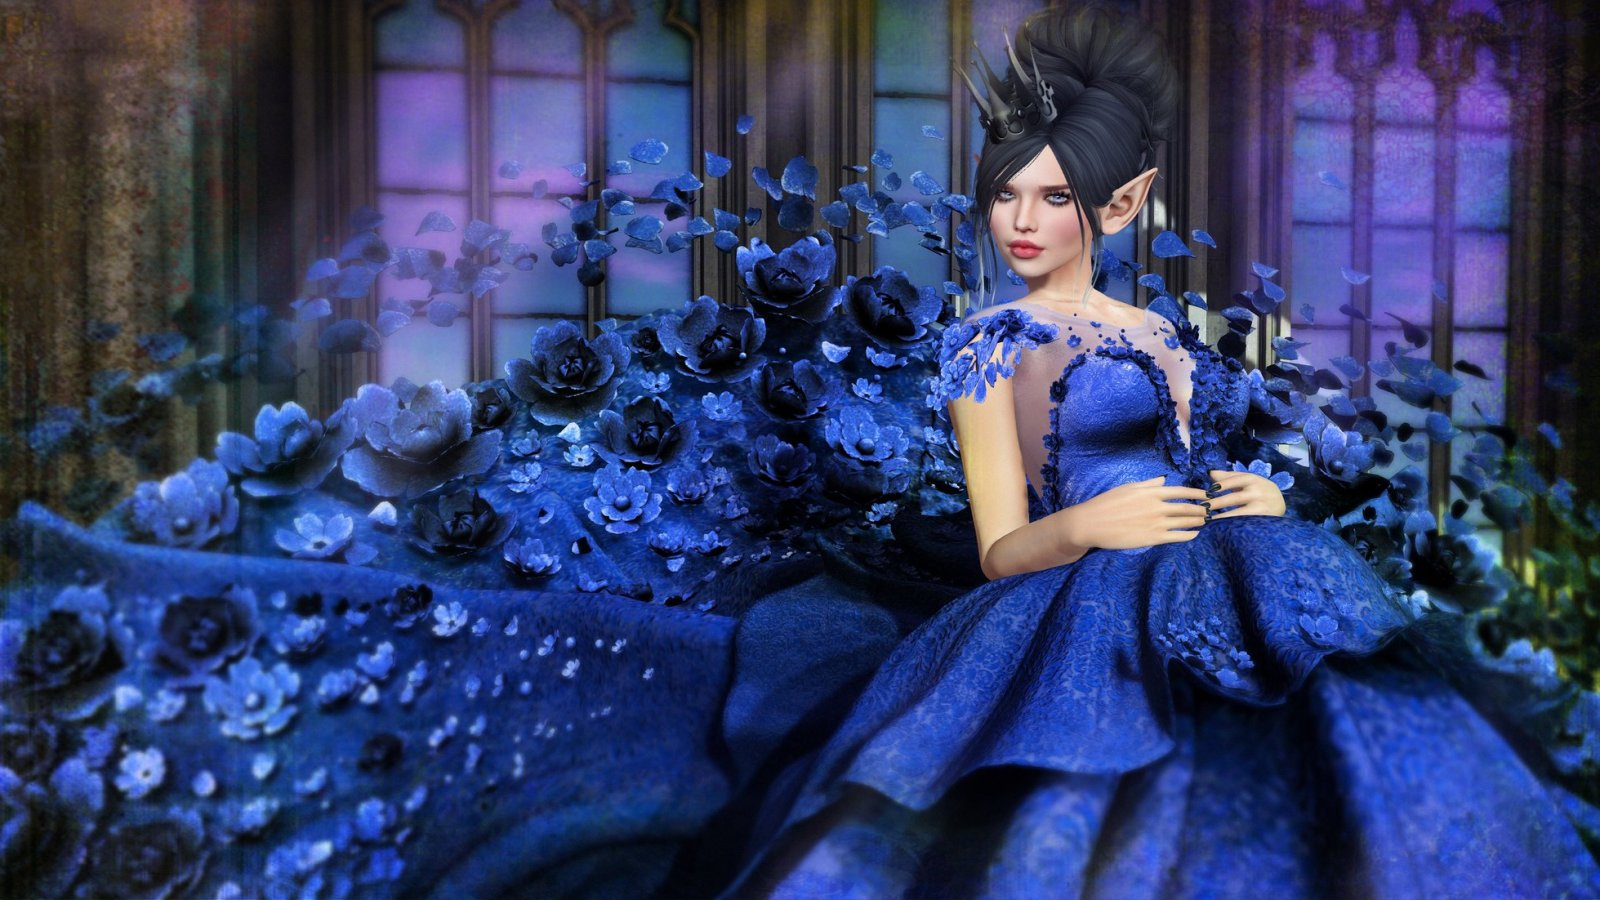 Passionate Belle